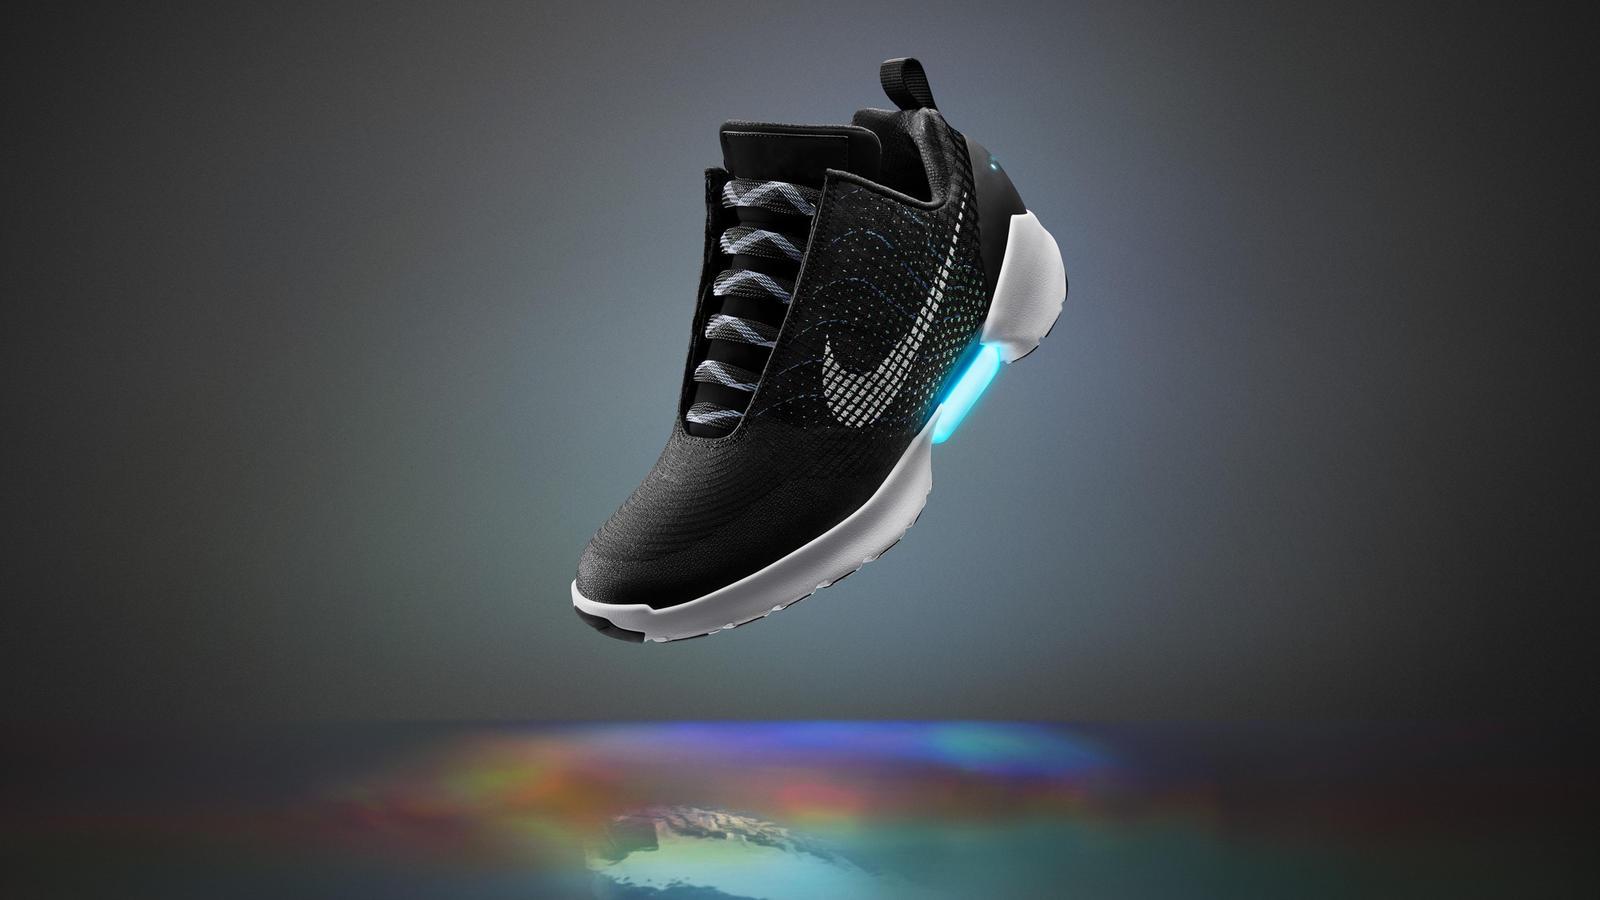 Futuristic Nike Shoes - Transformation Economy